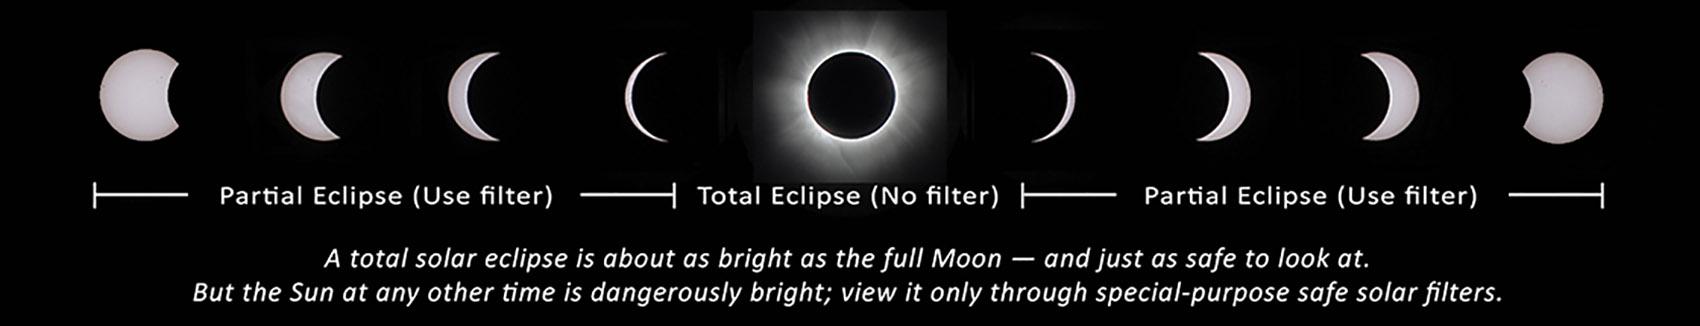 Eclipse Eye Safety Chart